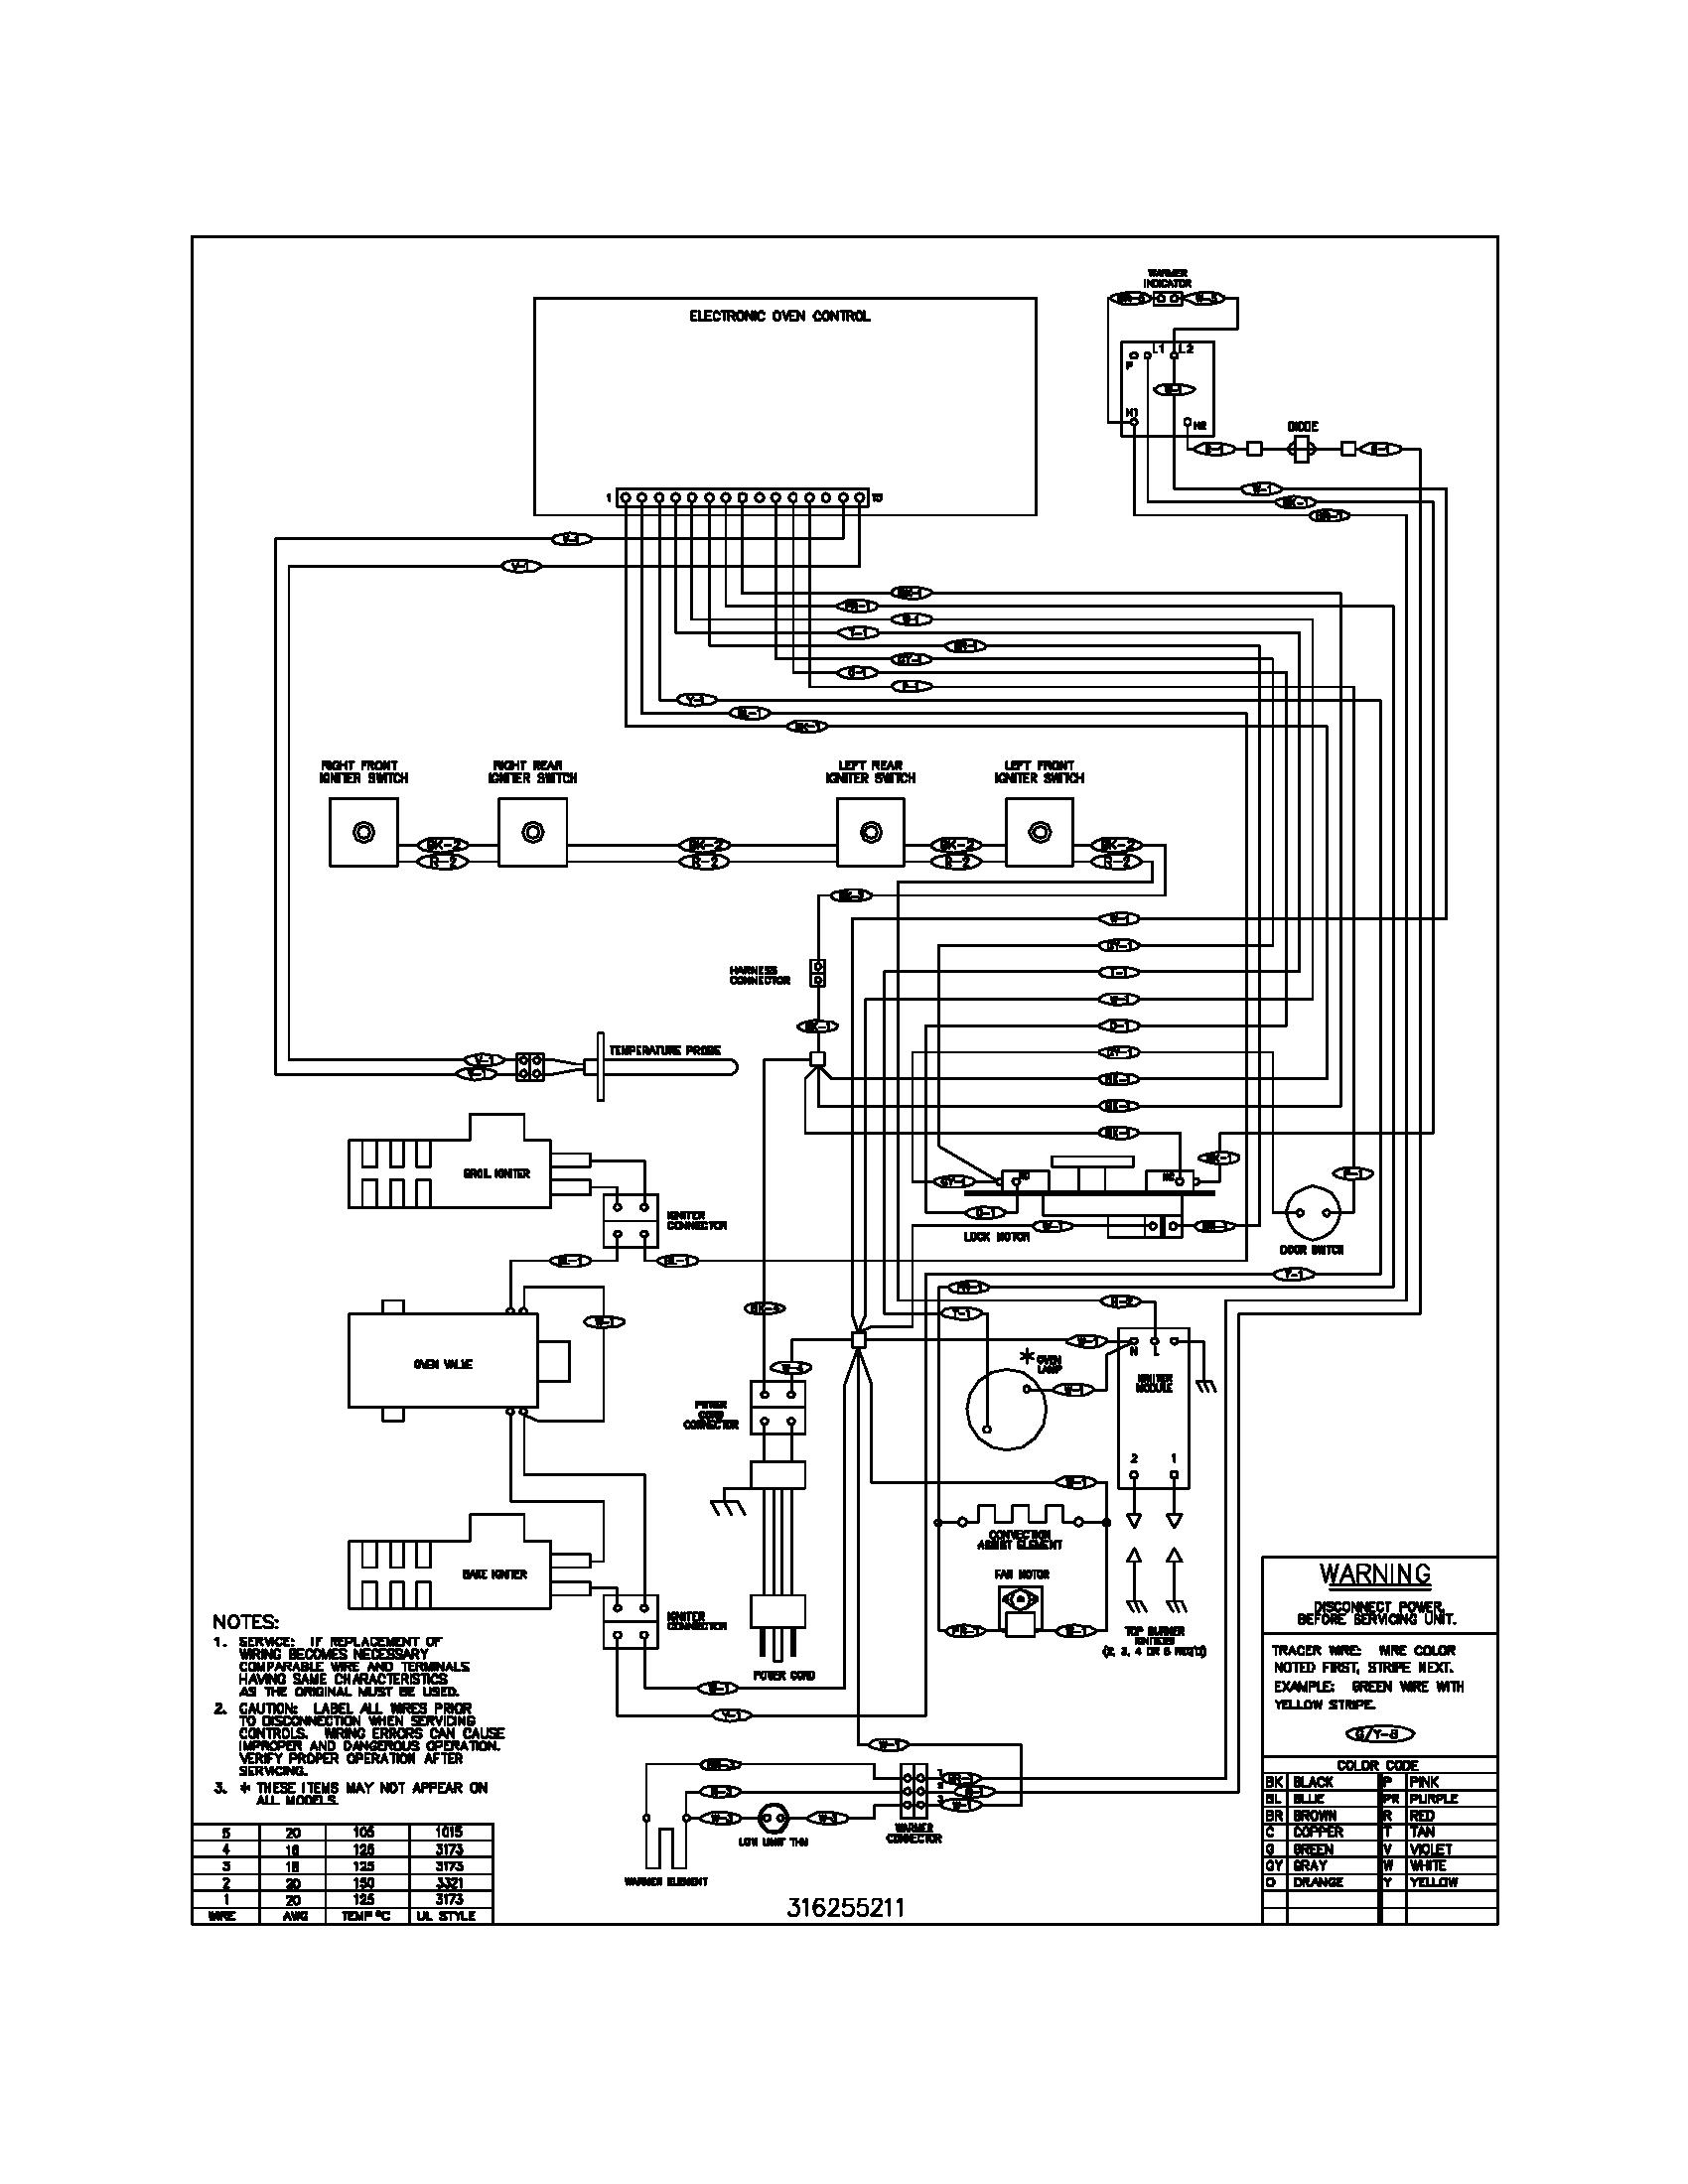 wiring diagram parts?resize\\\=665%2C861\\\&ssl\\\=1 trailer furnace wiring diagram on trailer images free download Gas Heater Wiring Diagram at bakdesigns.co